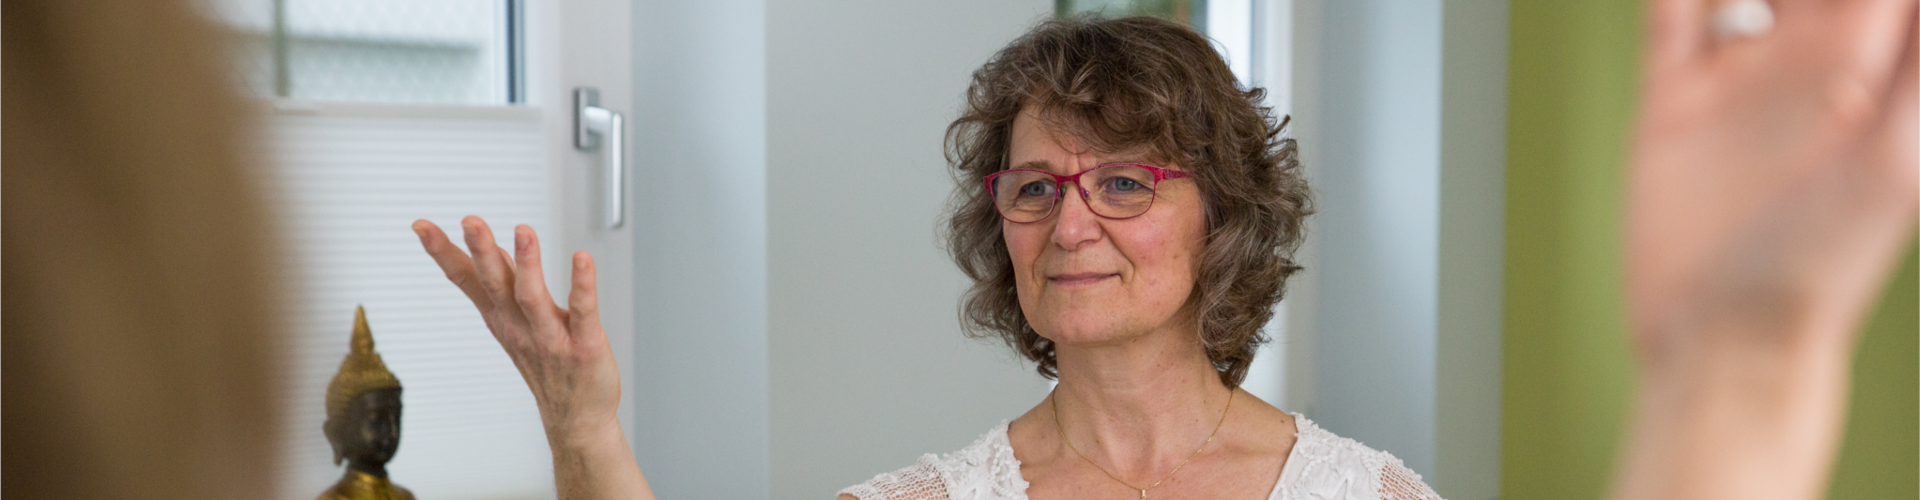 Annette Röhrig in Therapie